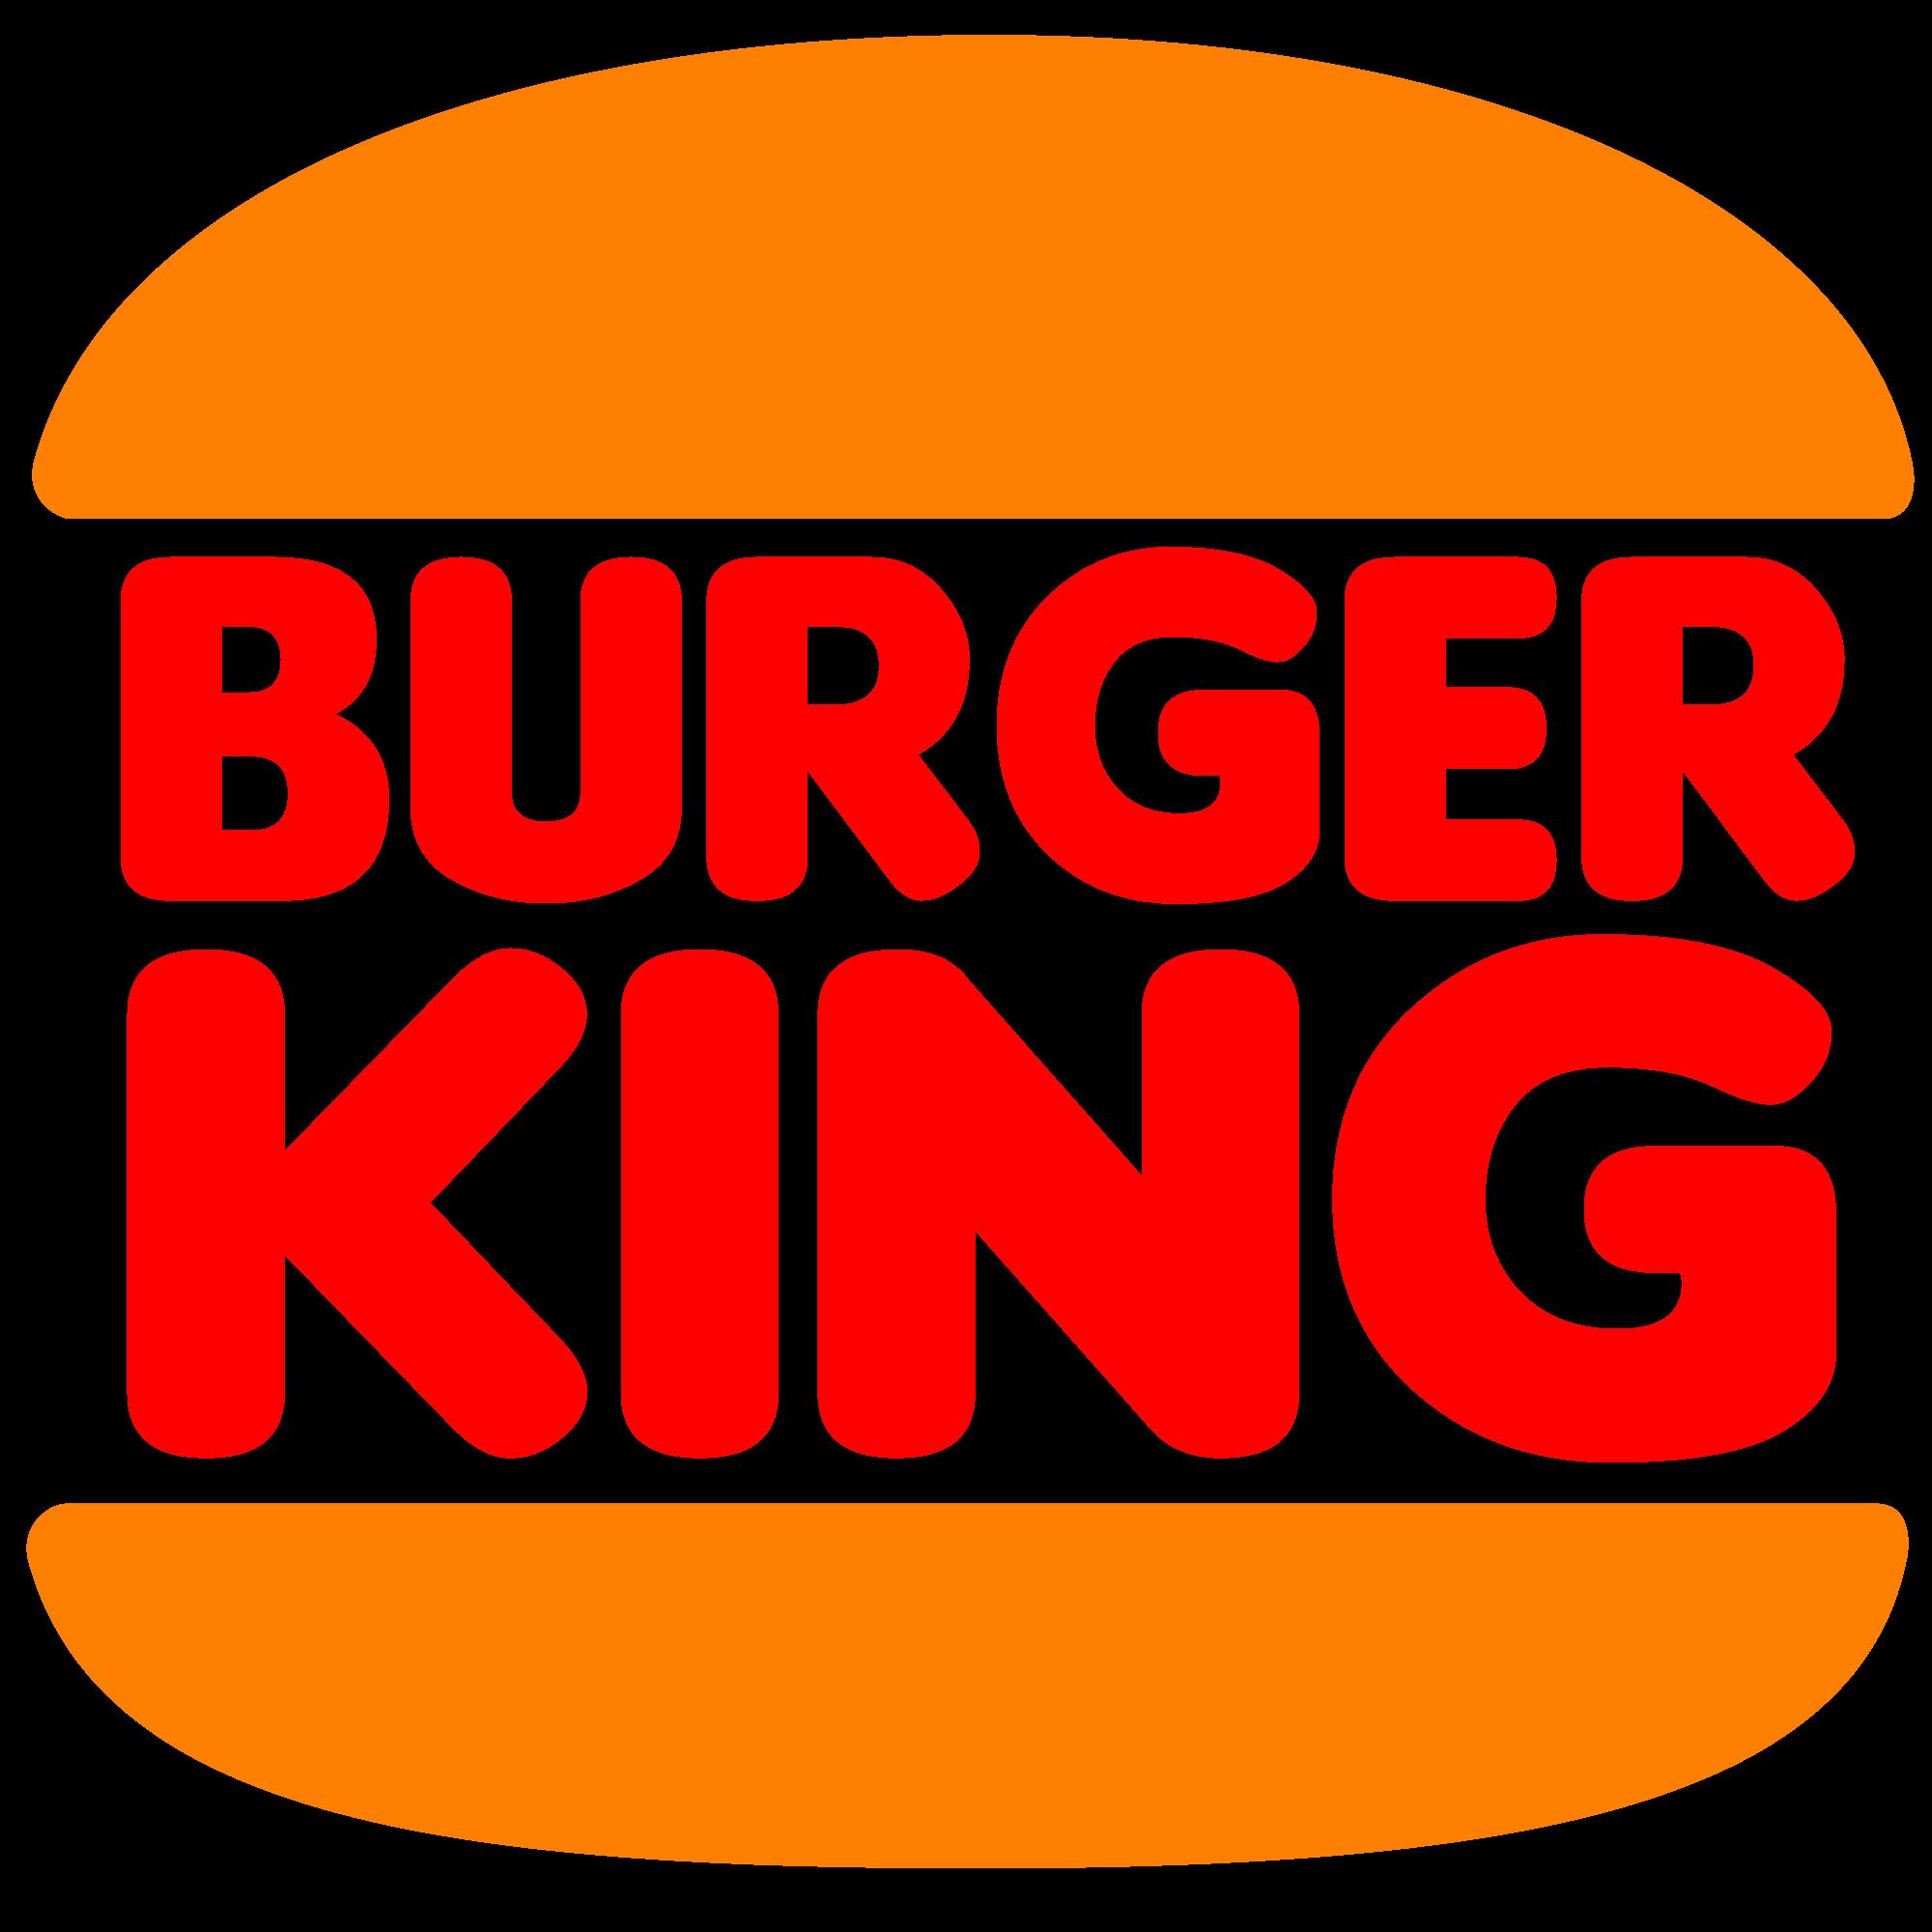 Logo Burger King Png - File:burger King Logo 2.png, Transparent background PNG HD thumbnail